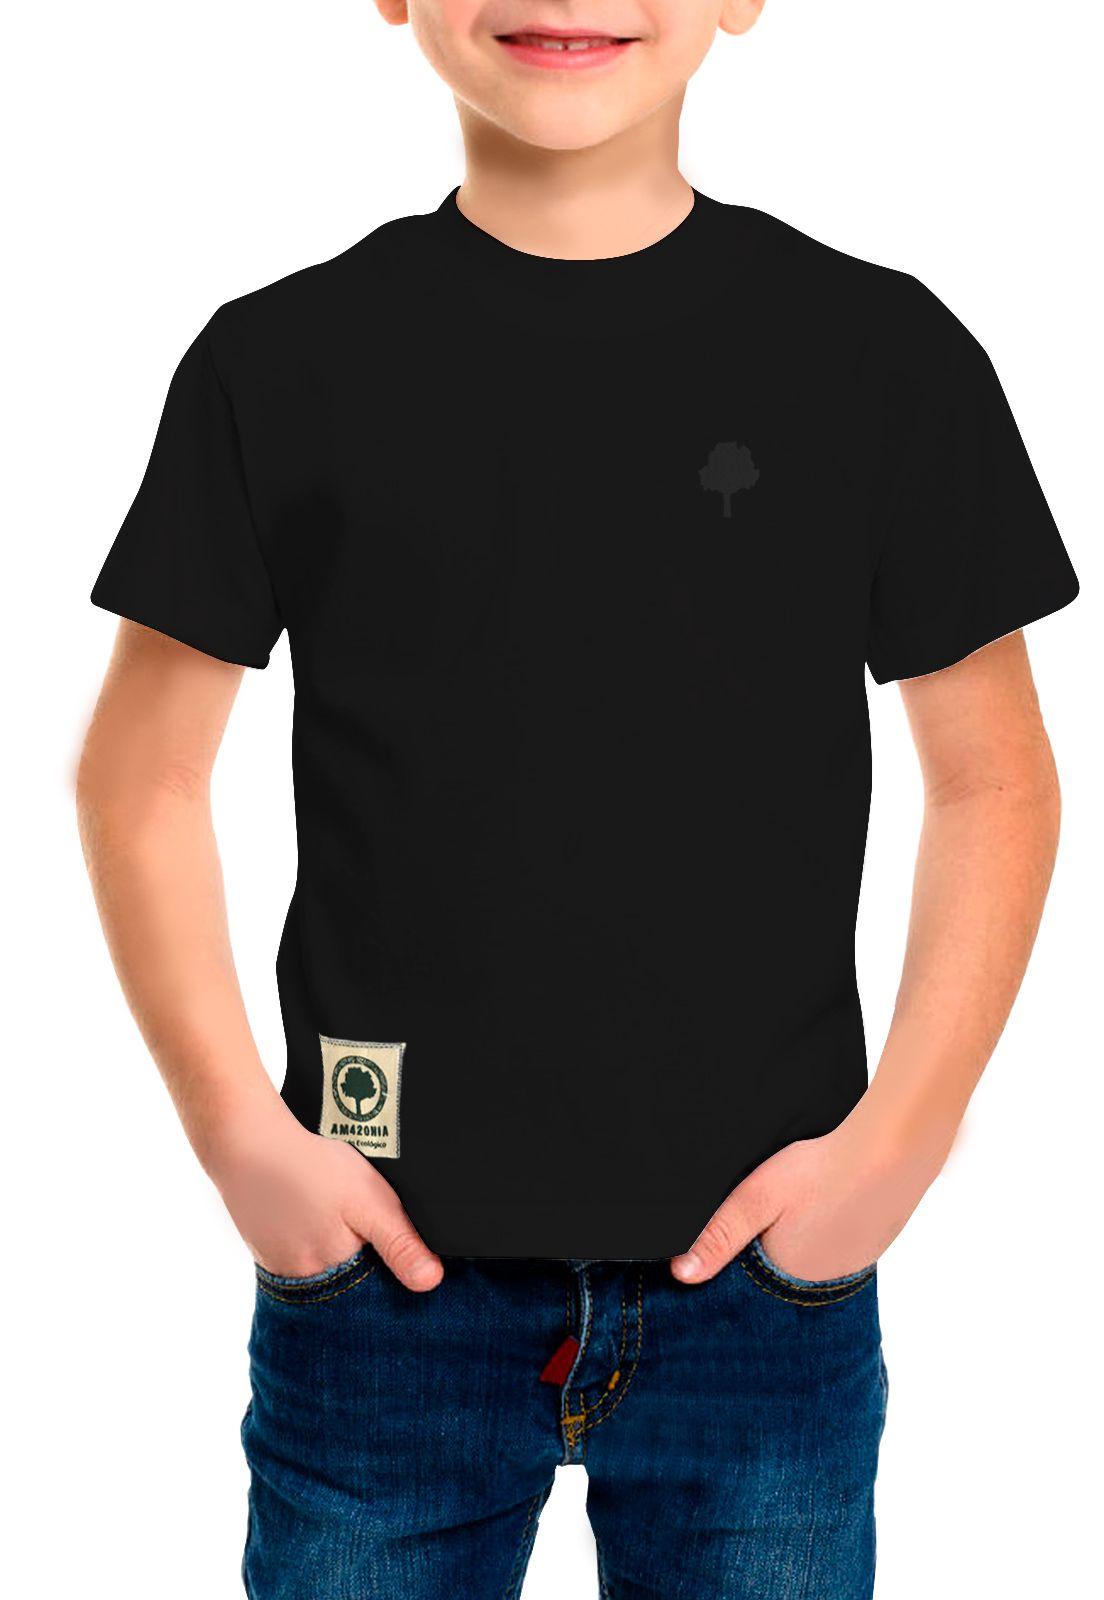 Camiseta Amazônia Infantil Básica Árvore Bordada - Preto